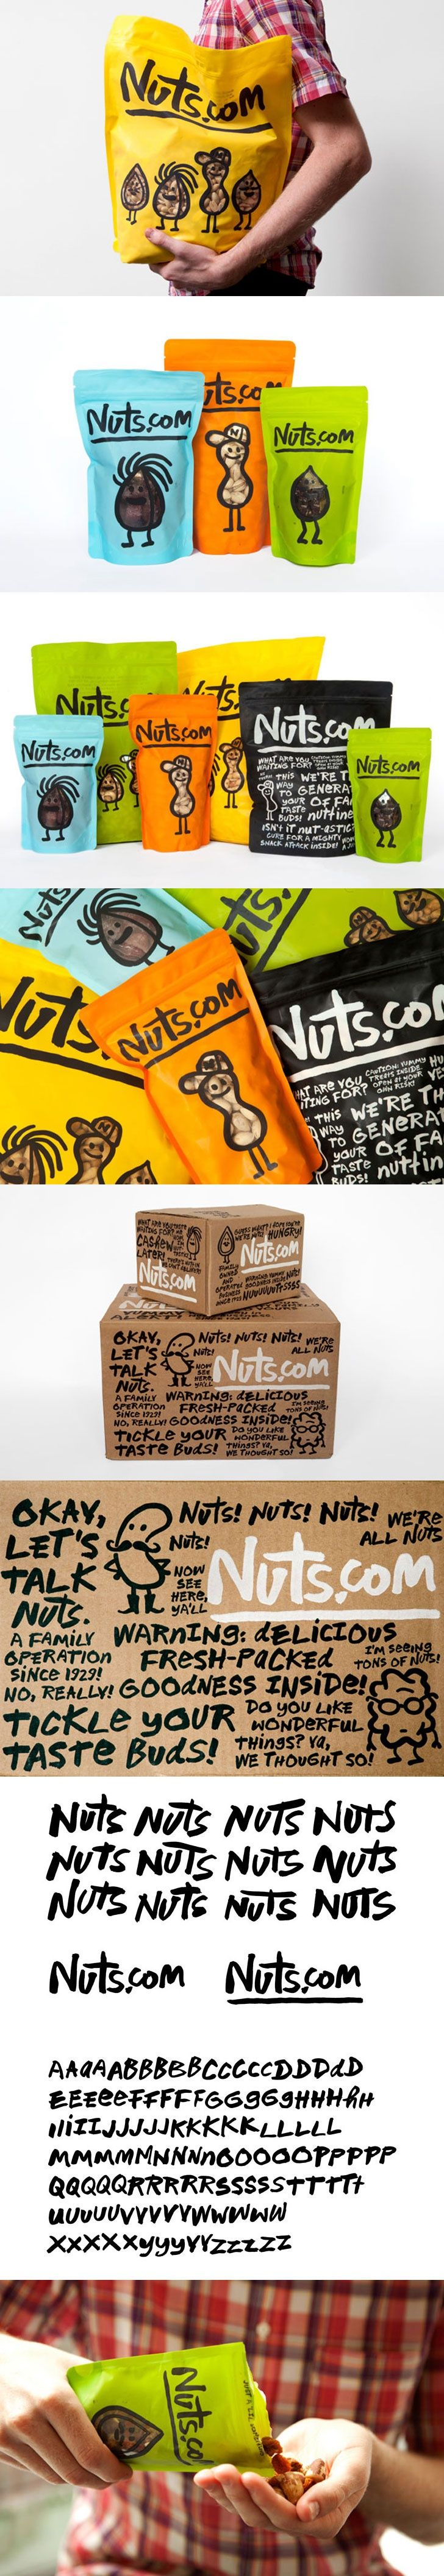 Expanded Nuts.com #packaging by Pentagram.